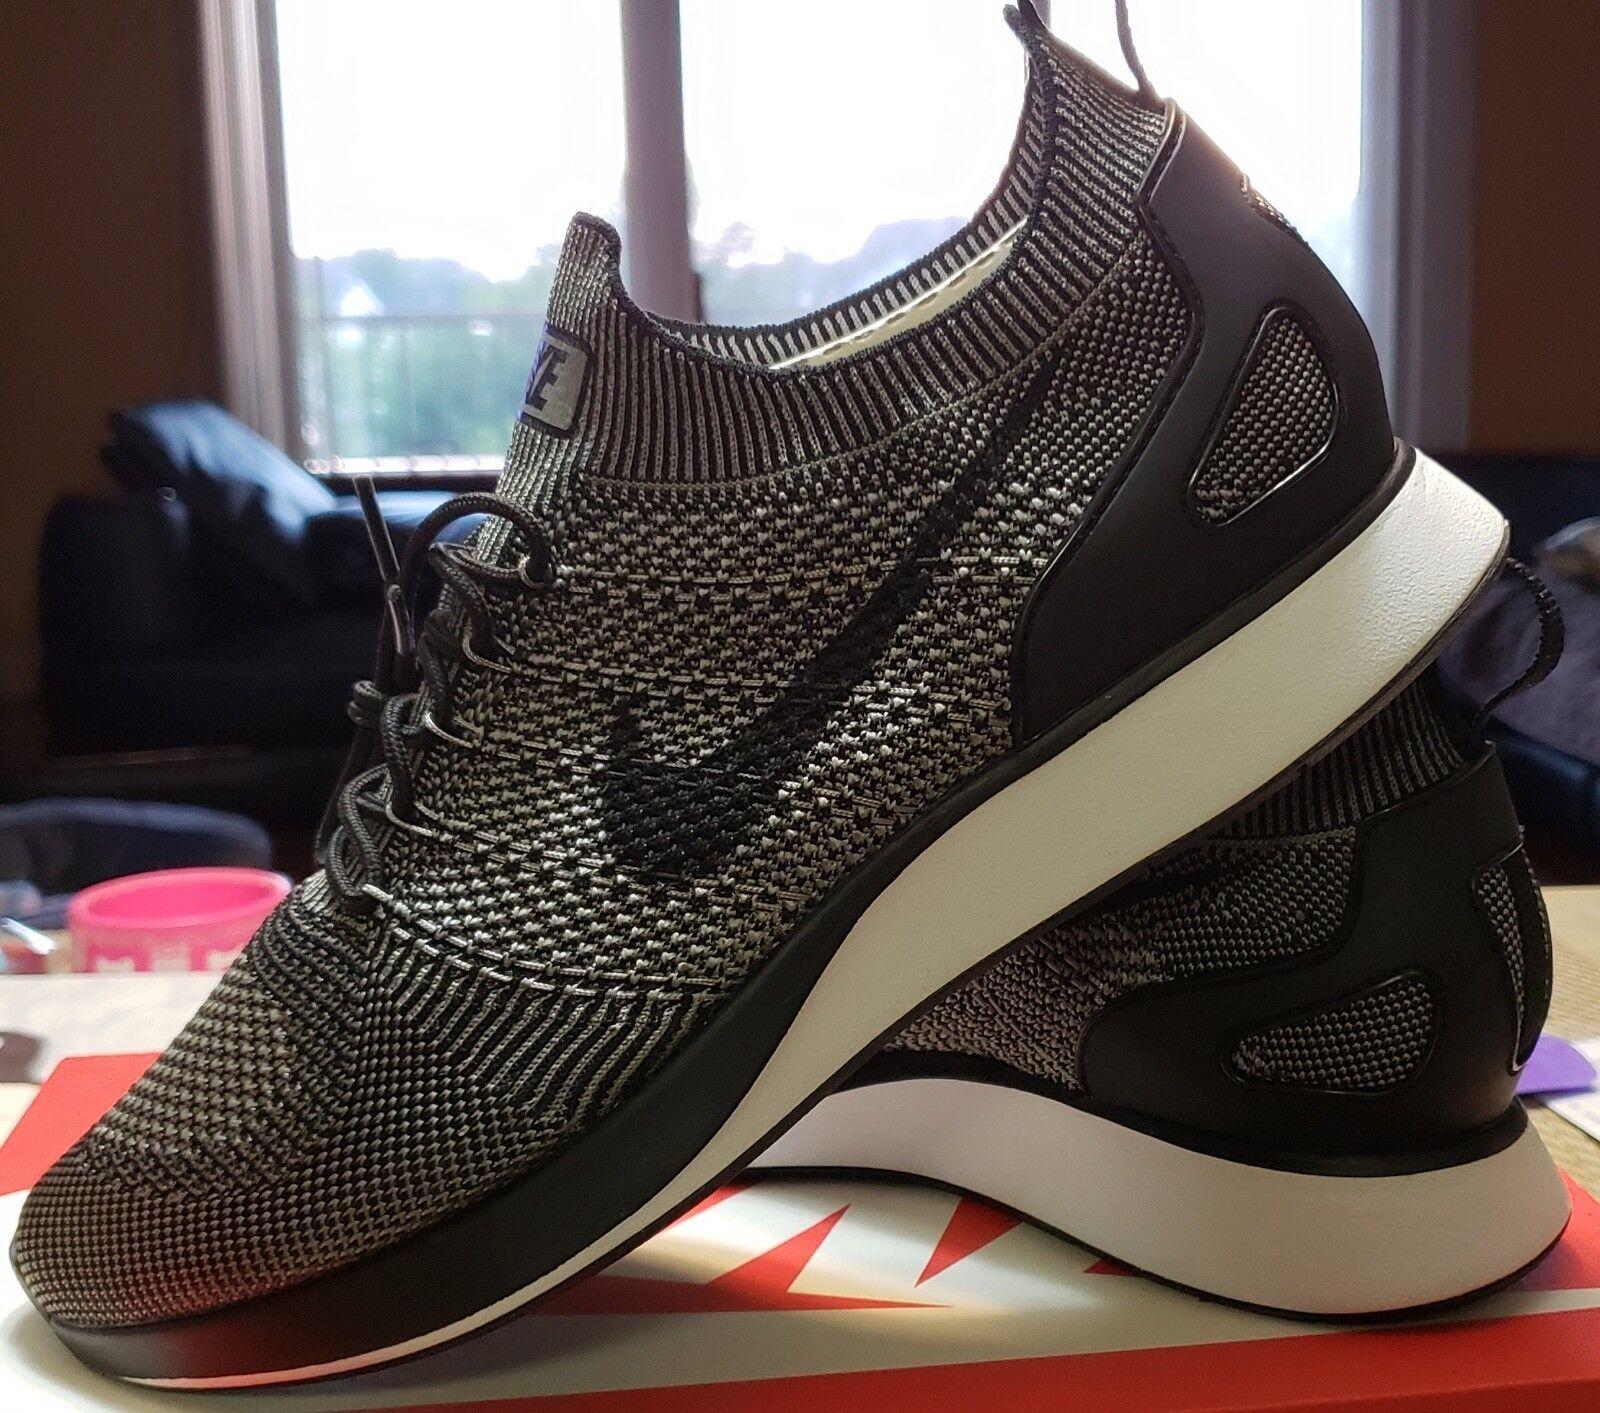 8f59775cc0d Nike Air Zoom Mariah Flyknit Racer 918264008 Men s Light Light Light  Charcoal size 10 4db38a